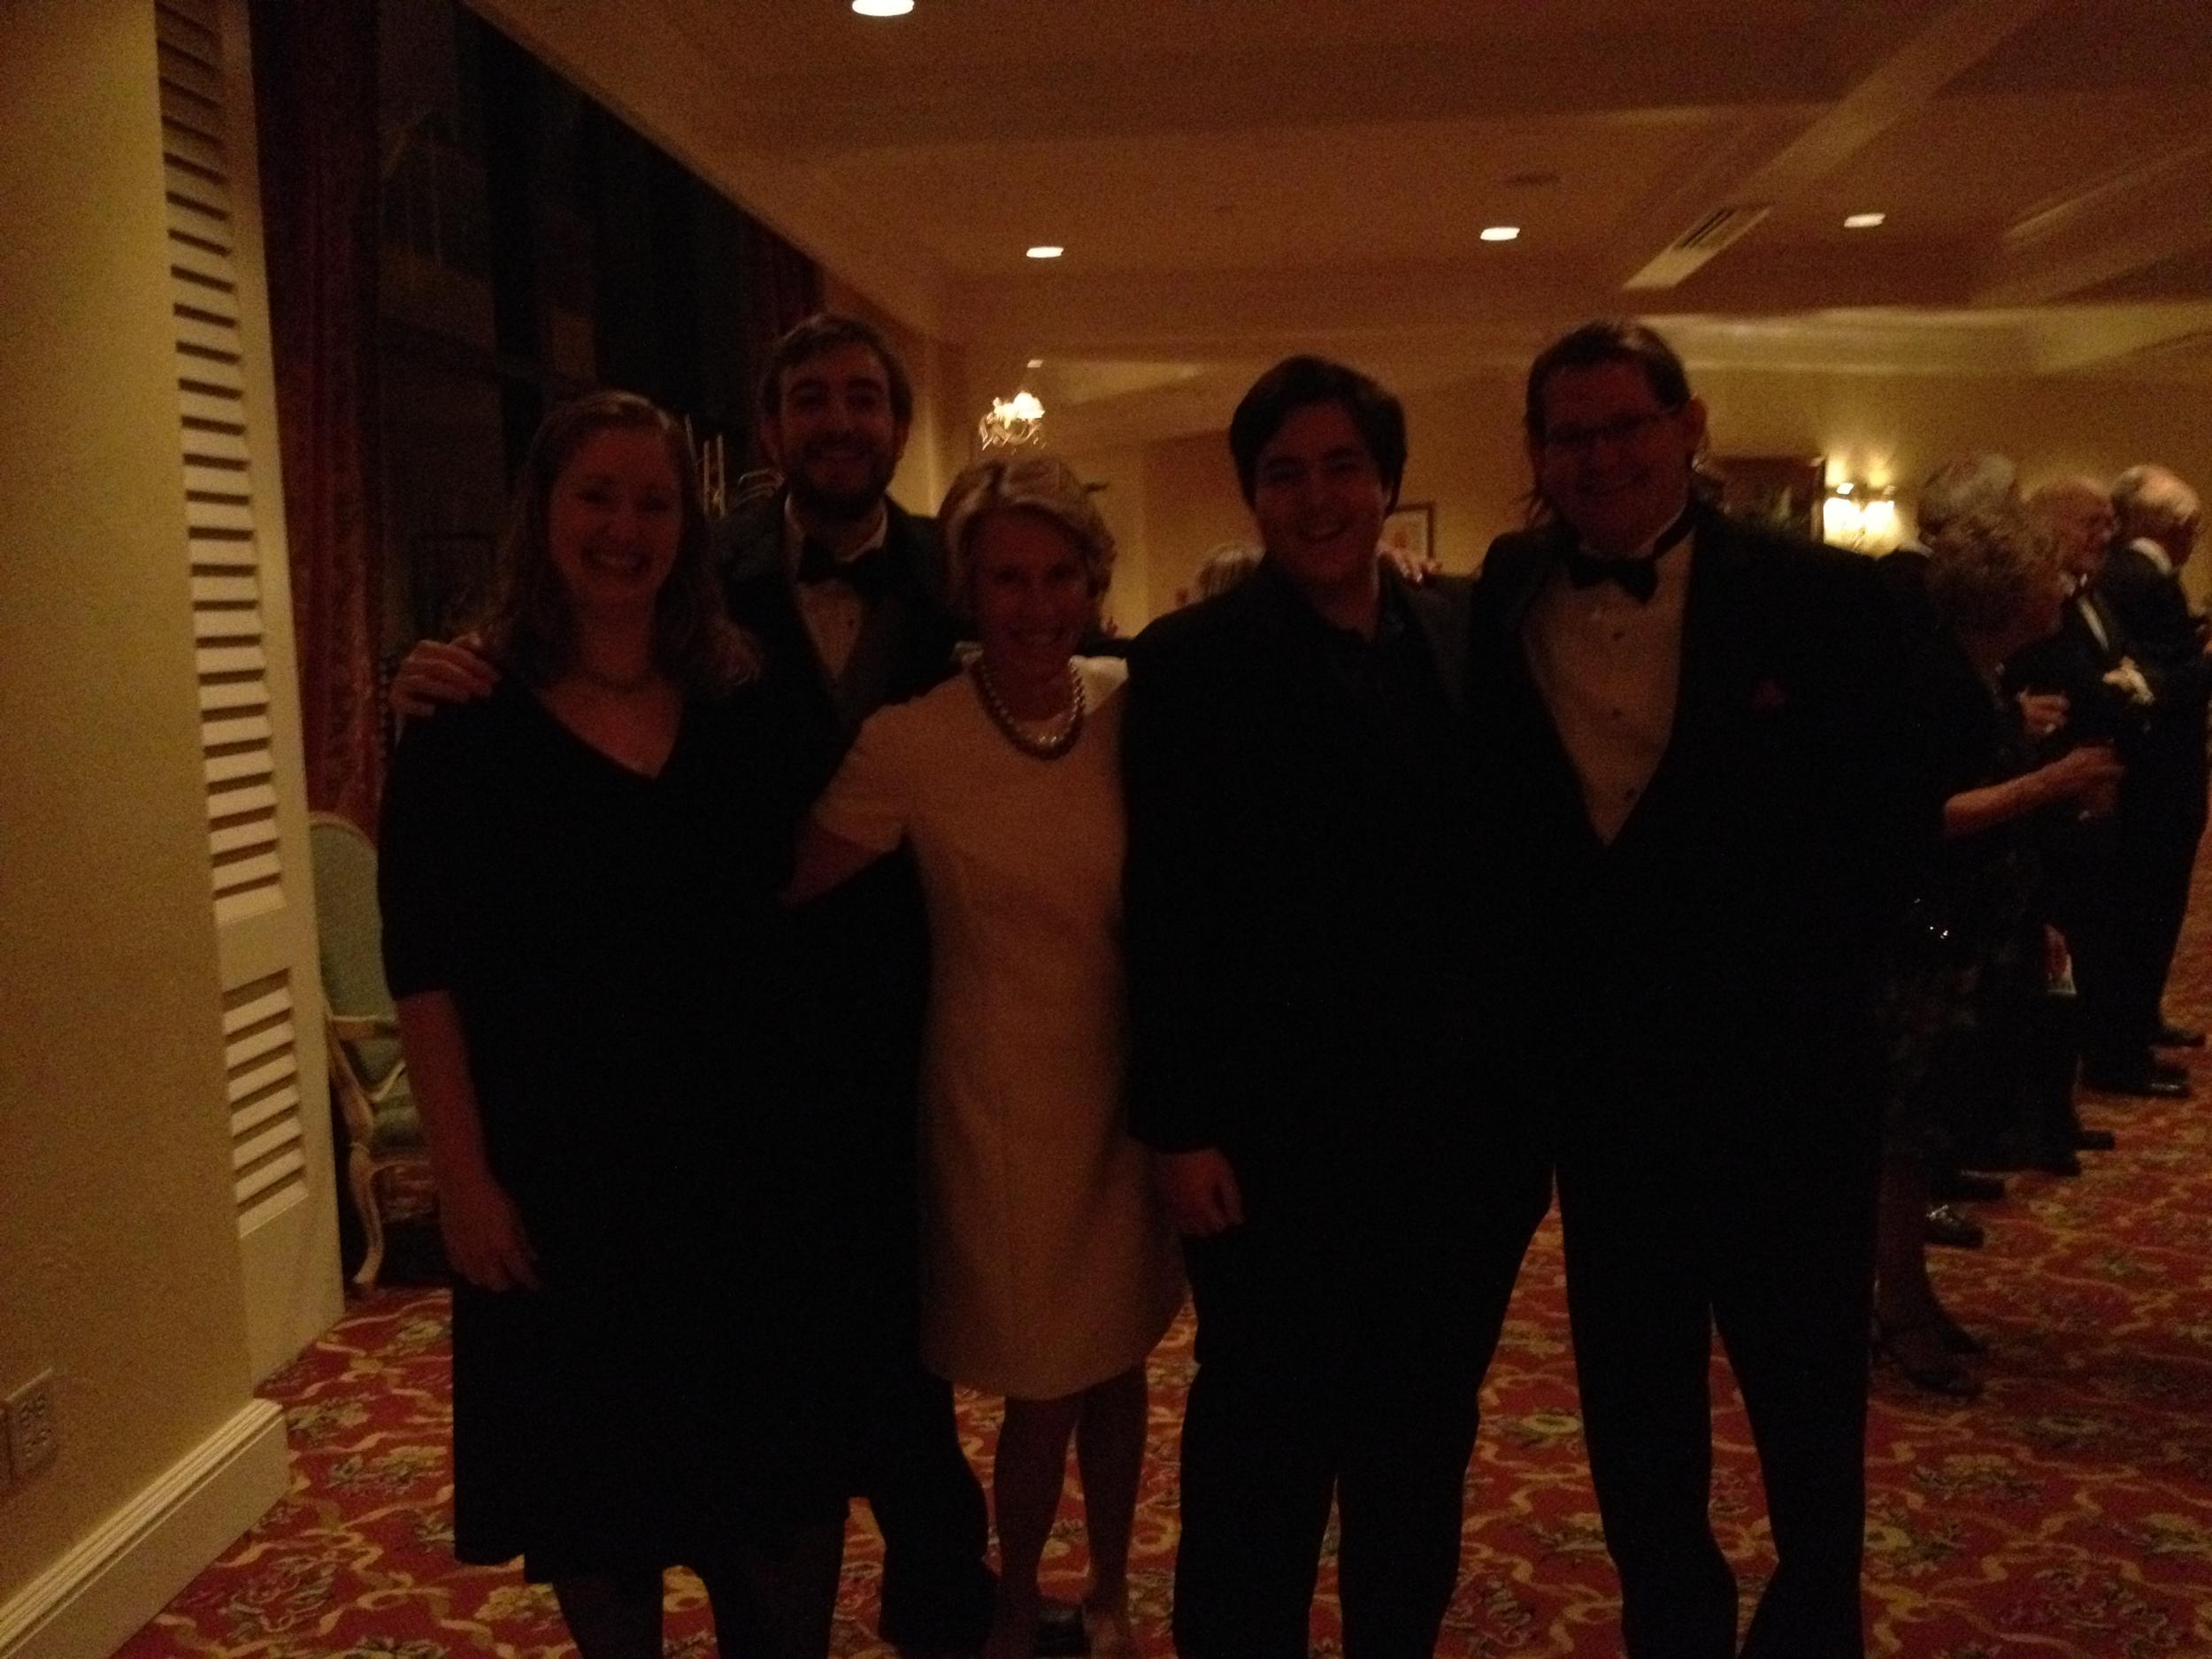 Theri, Adam P, Patty, Adam K, Robert - Bermuda 2012